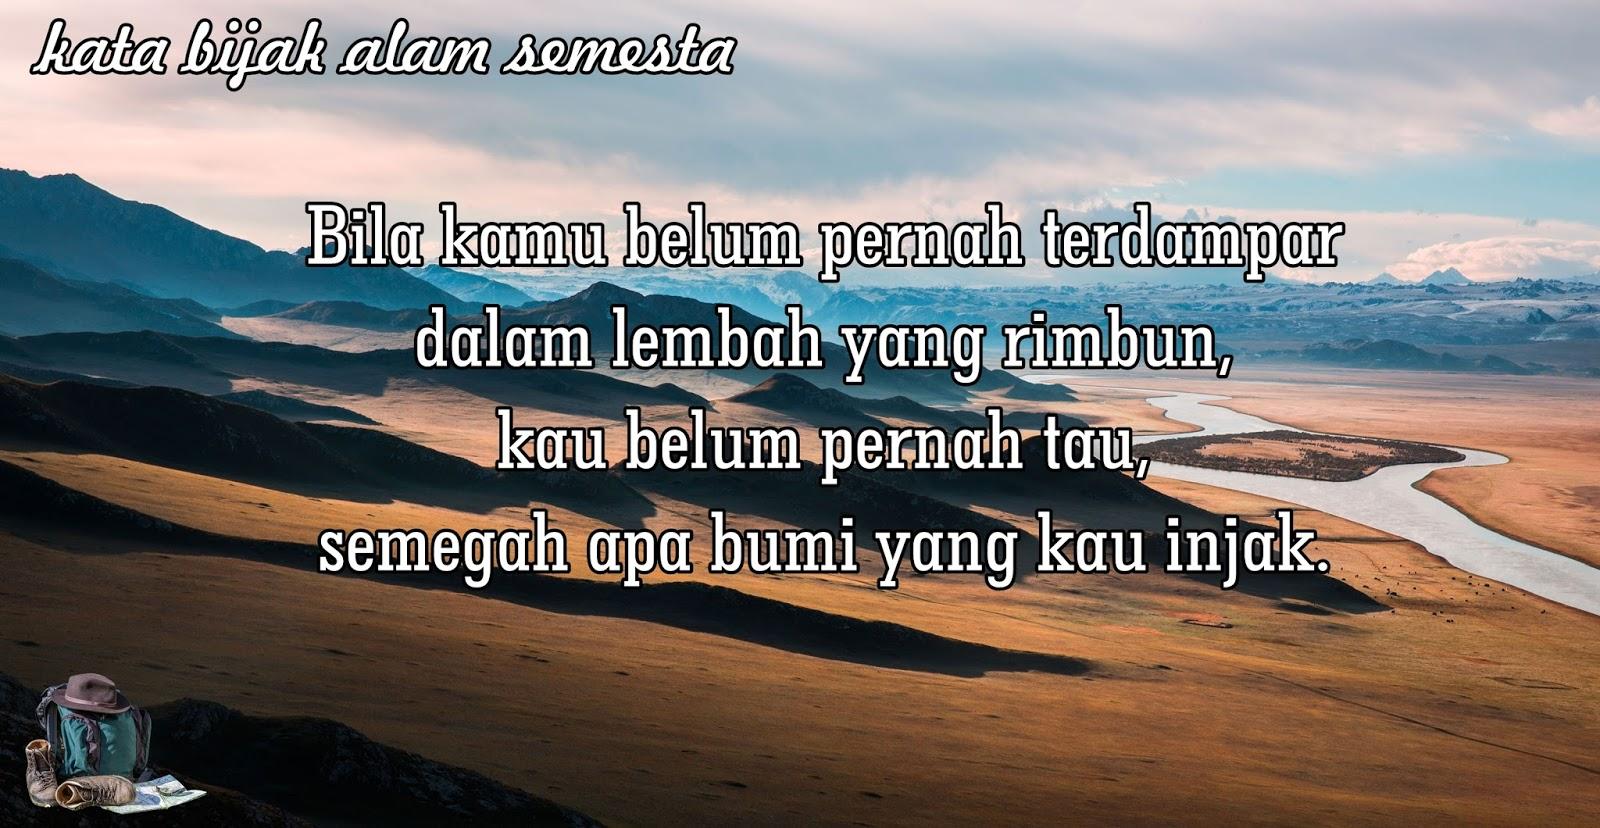 Caption Alam Singkat 3